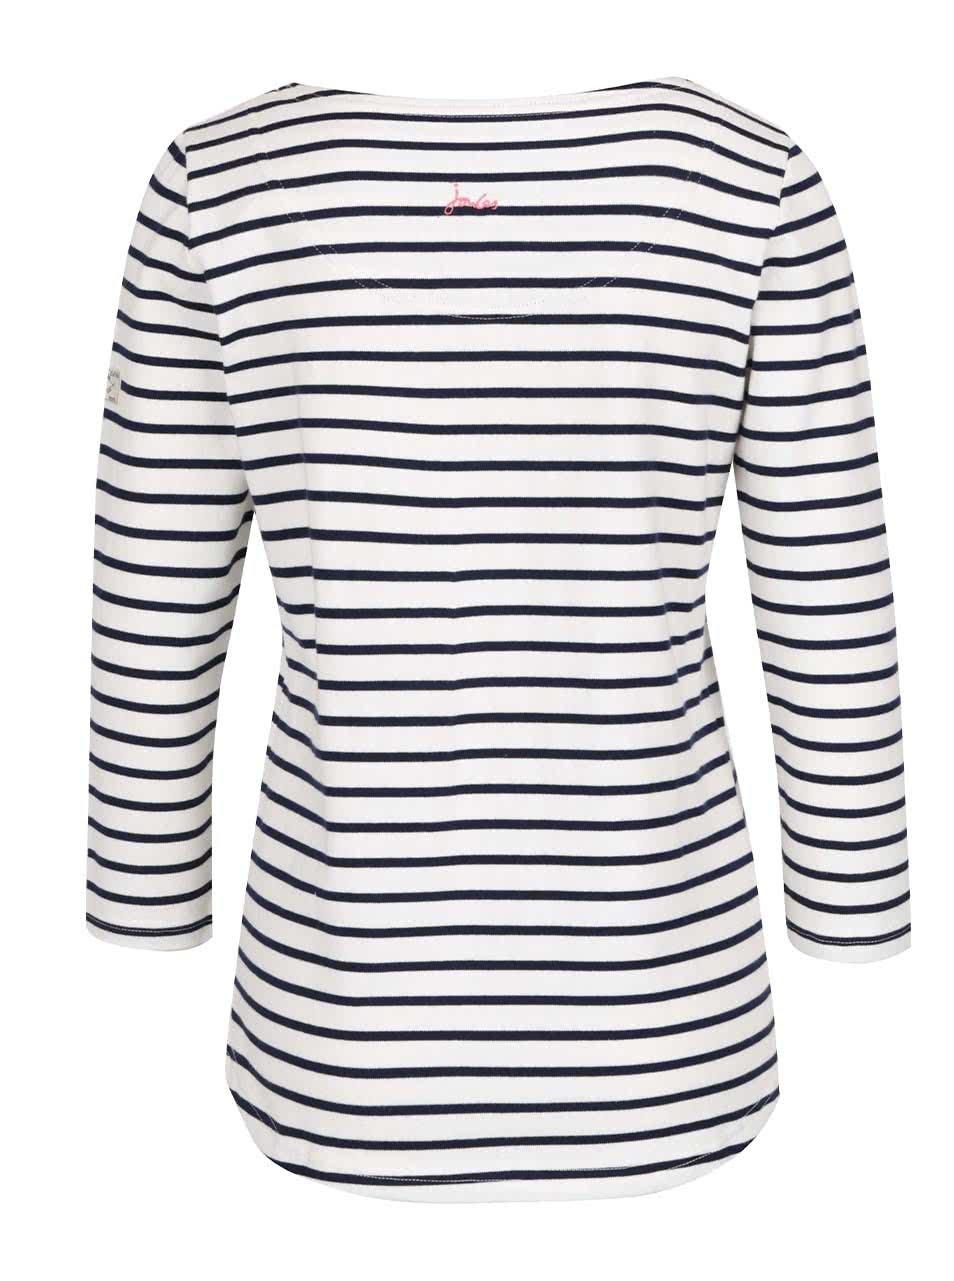 8696b482c6 Modro-krémové dámske pruhované tričko Tom Joule Harbour ...